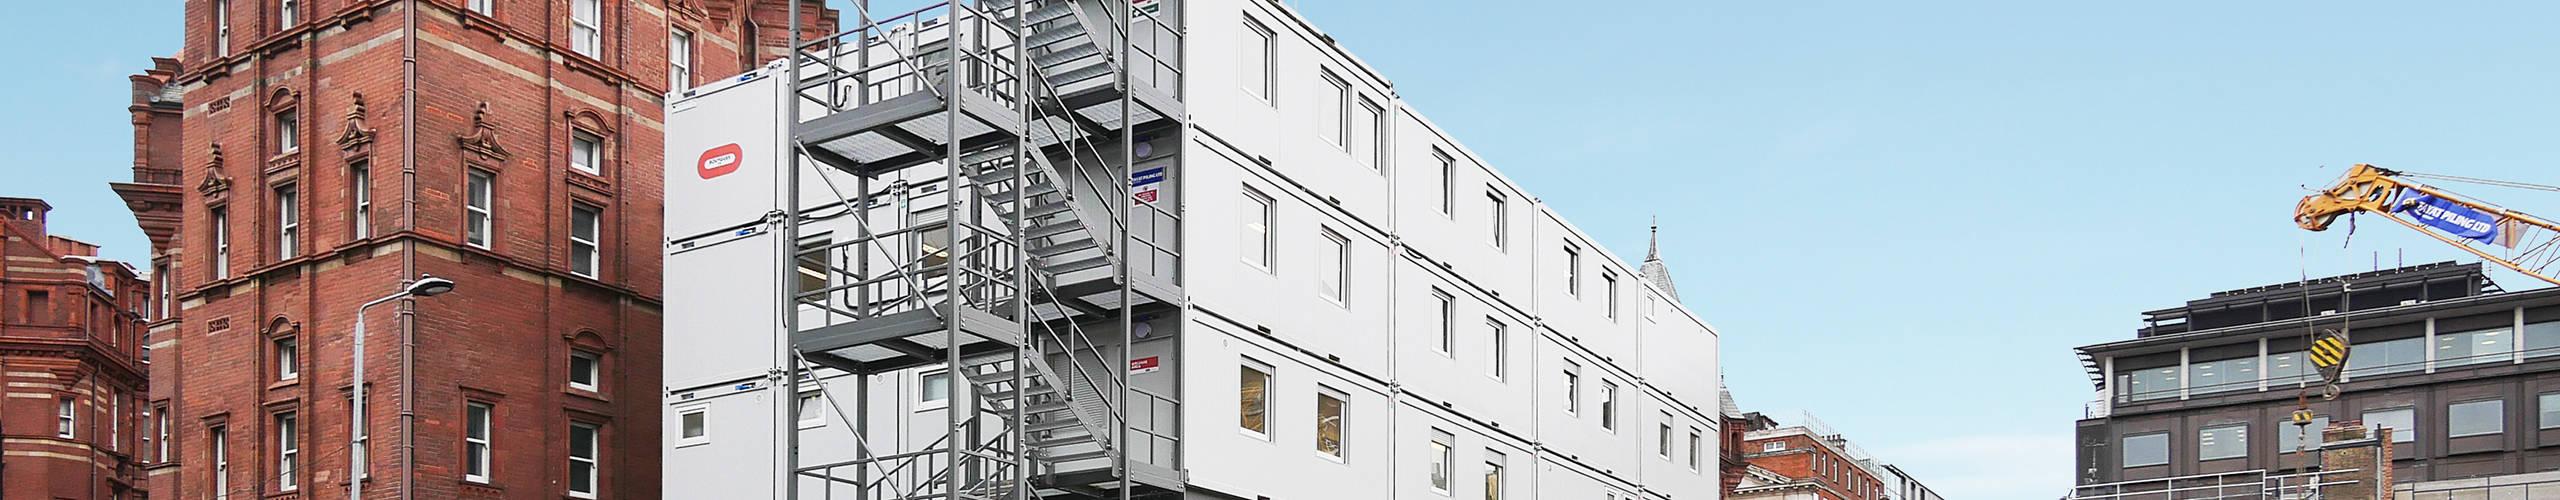 Conjuntode contentores escritório de aluguer nosUniversity College London Hospitals, GB-Londres